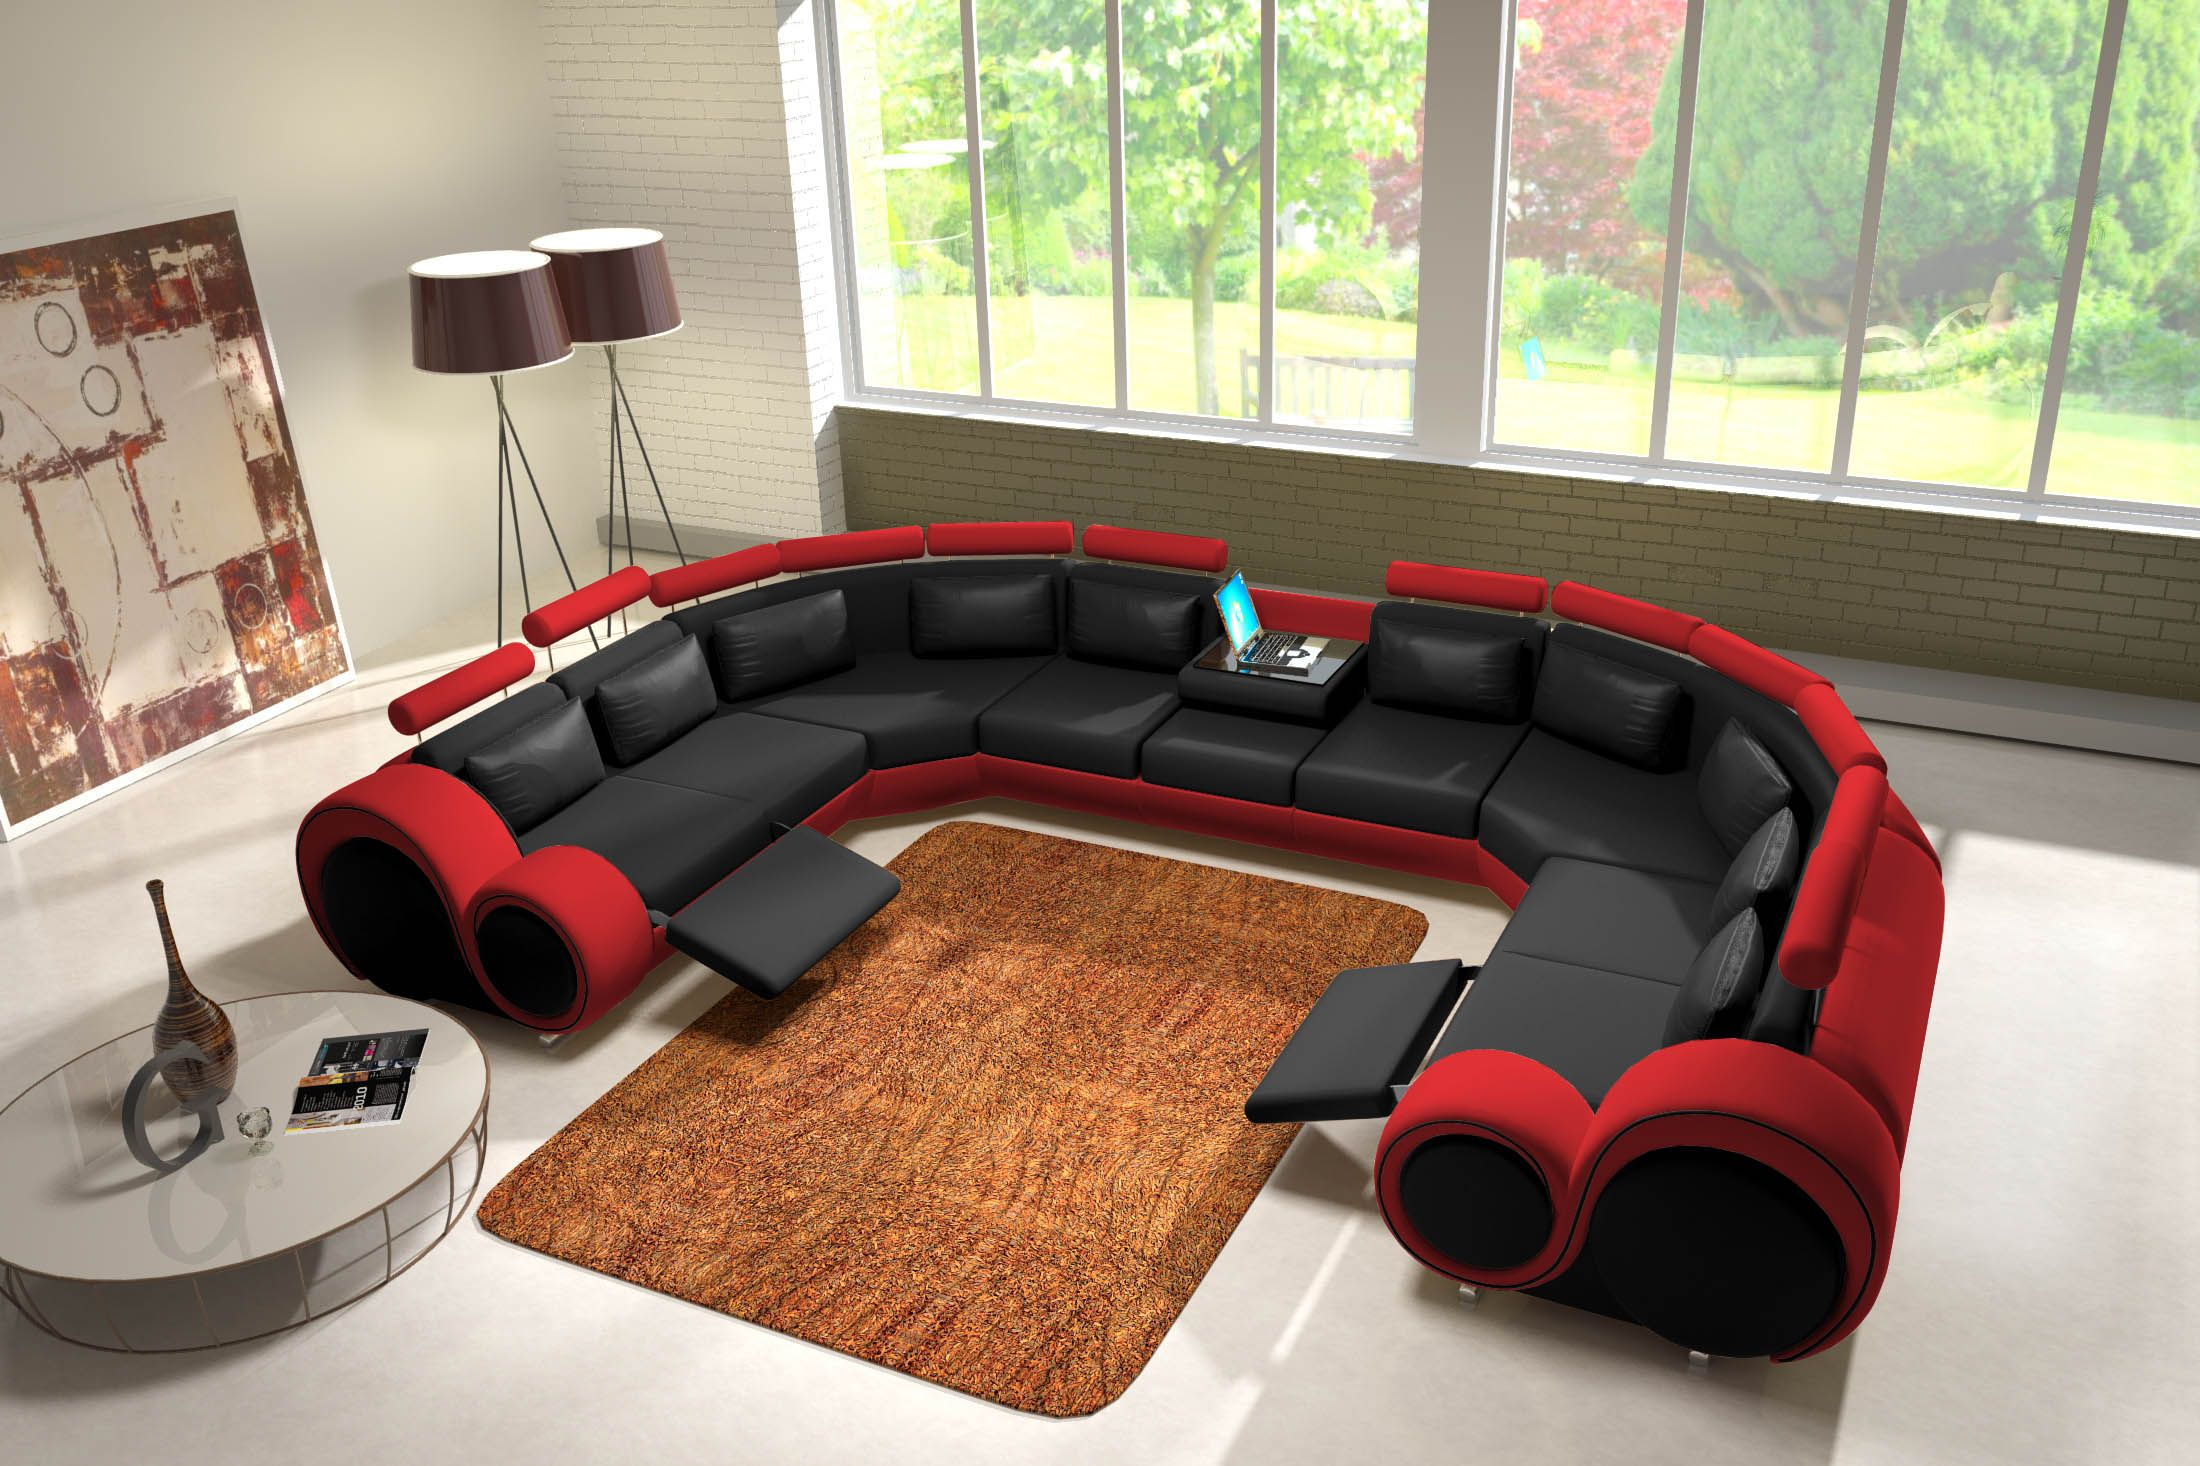 Eckcouch u form  JVmoebel - Ledersofa Couch Sofa Ecksofa Modell Berlin IV U-Form ...